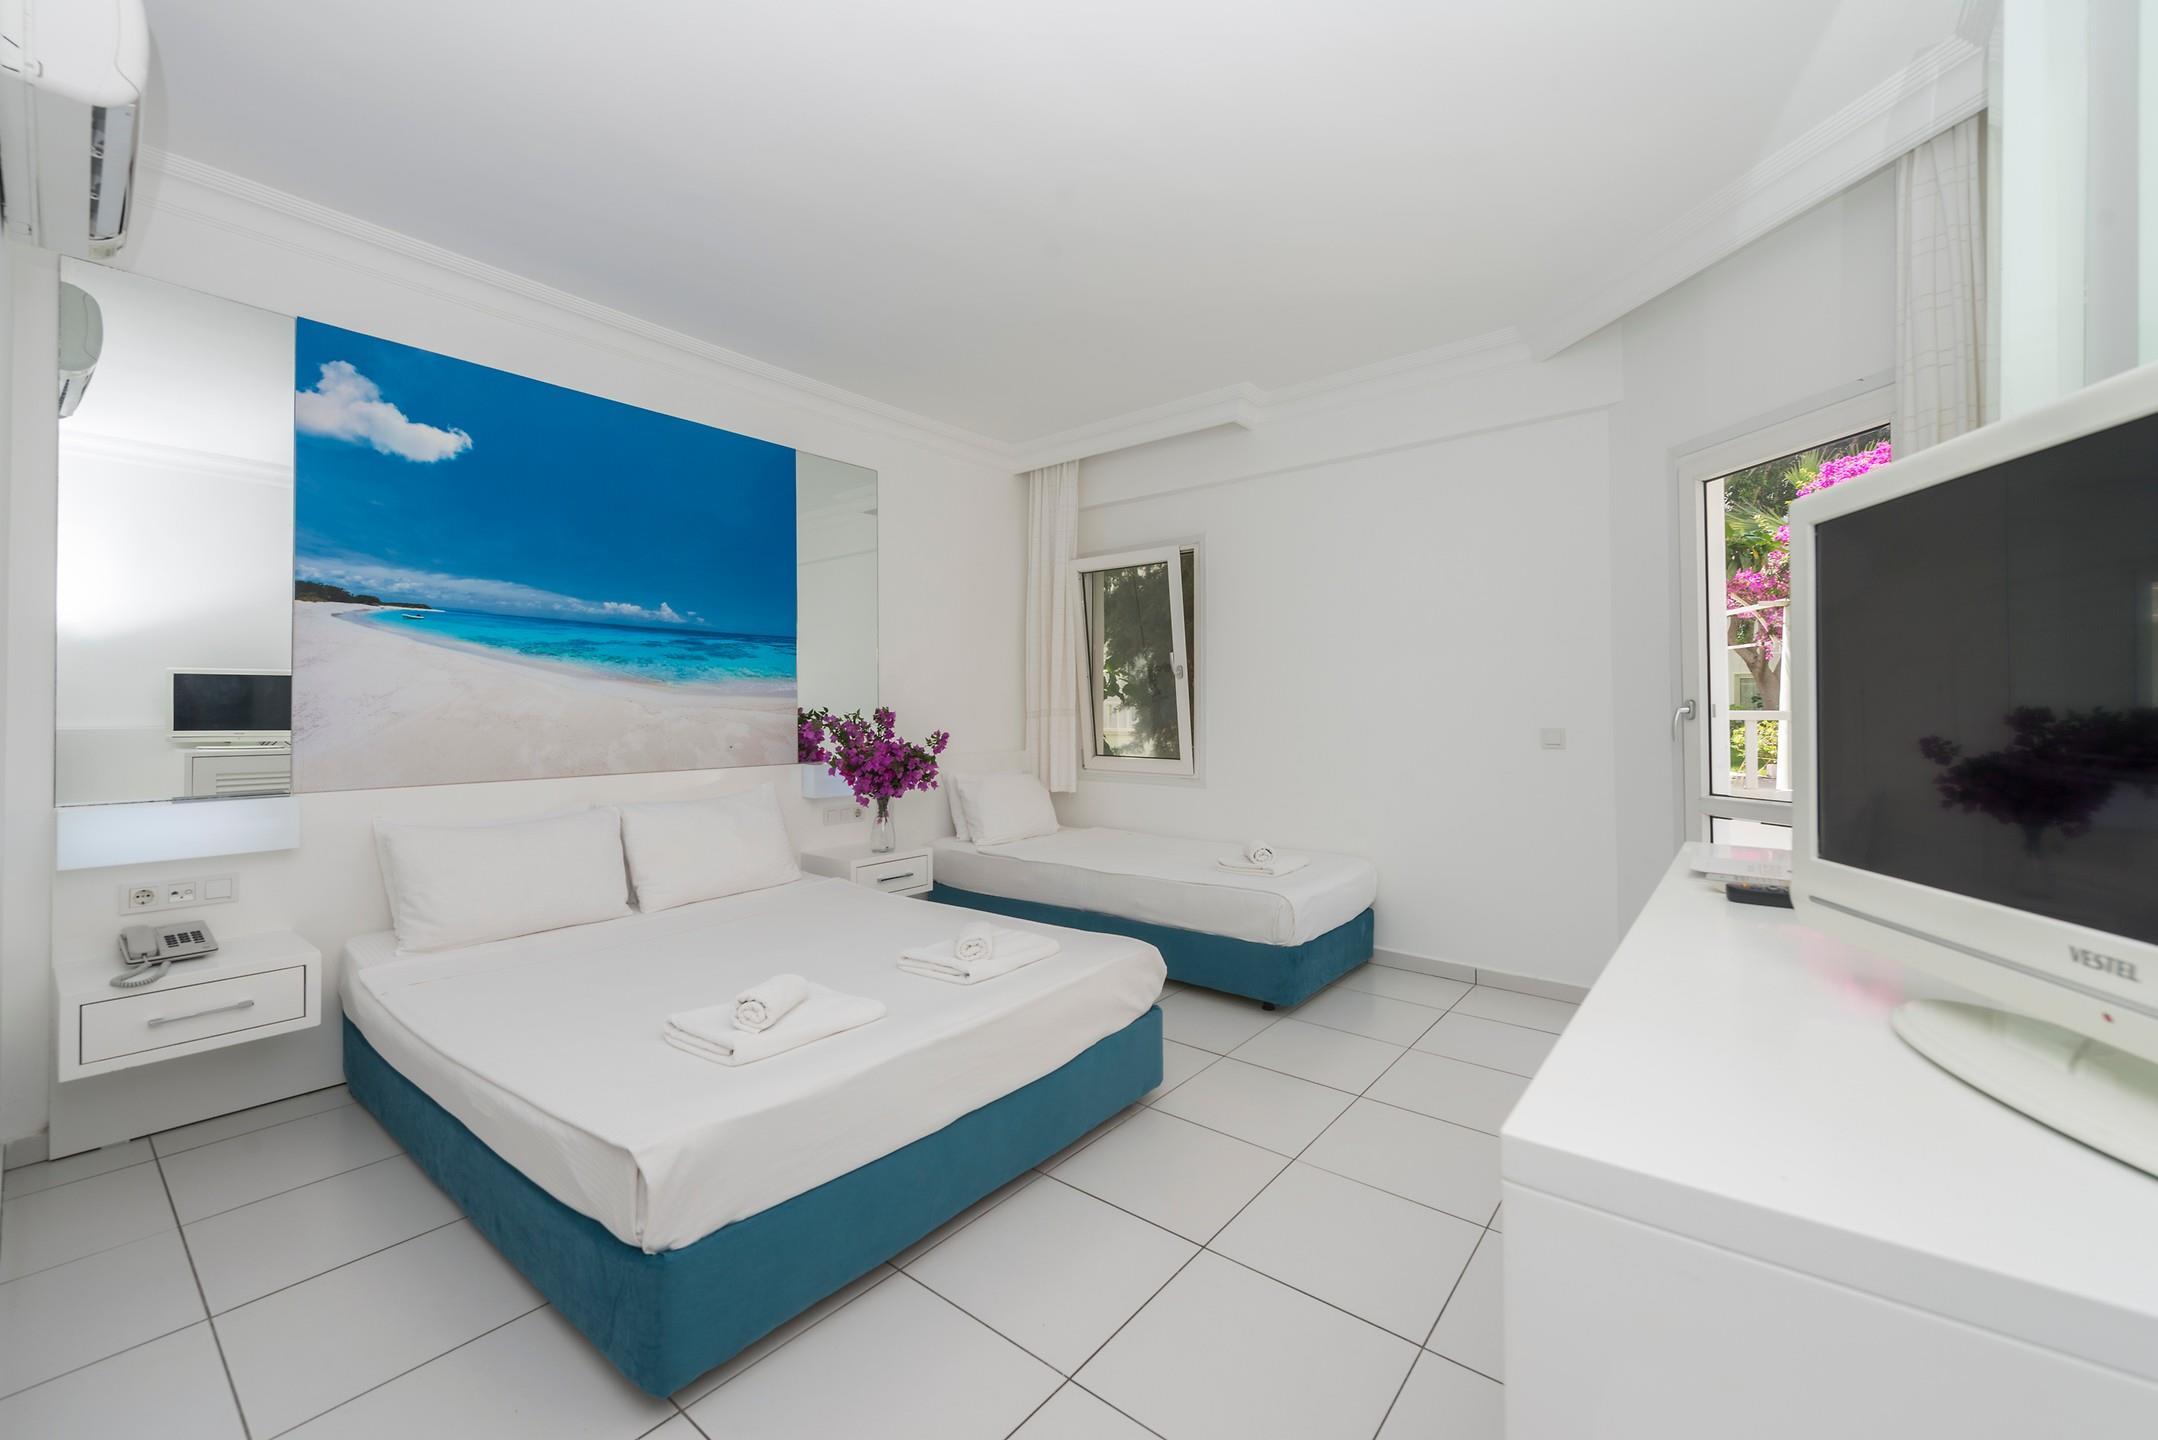 bendis-beach-hotel-genel-004